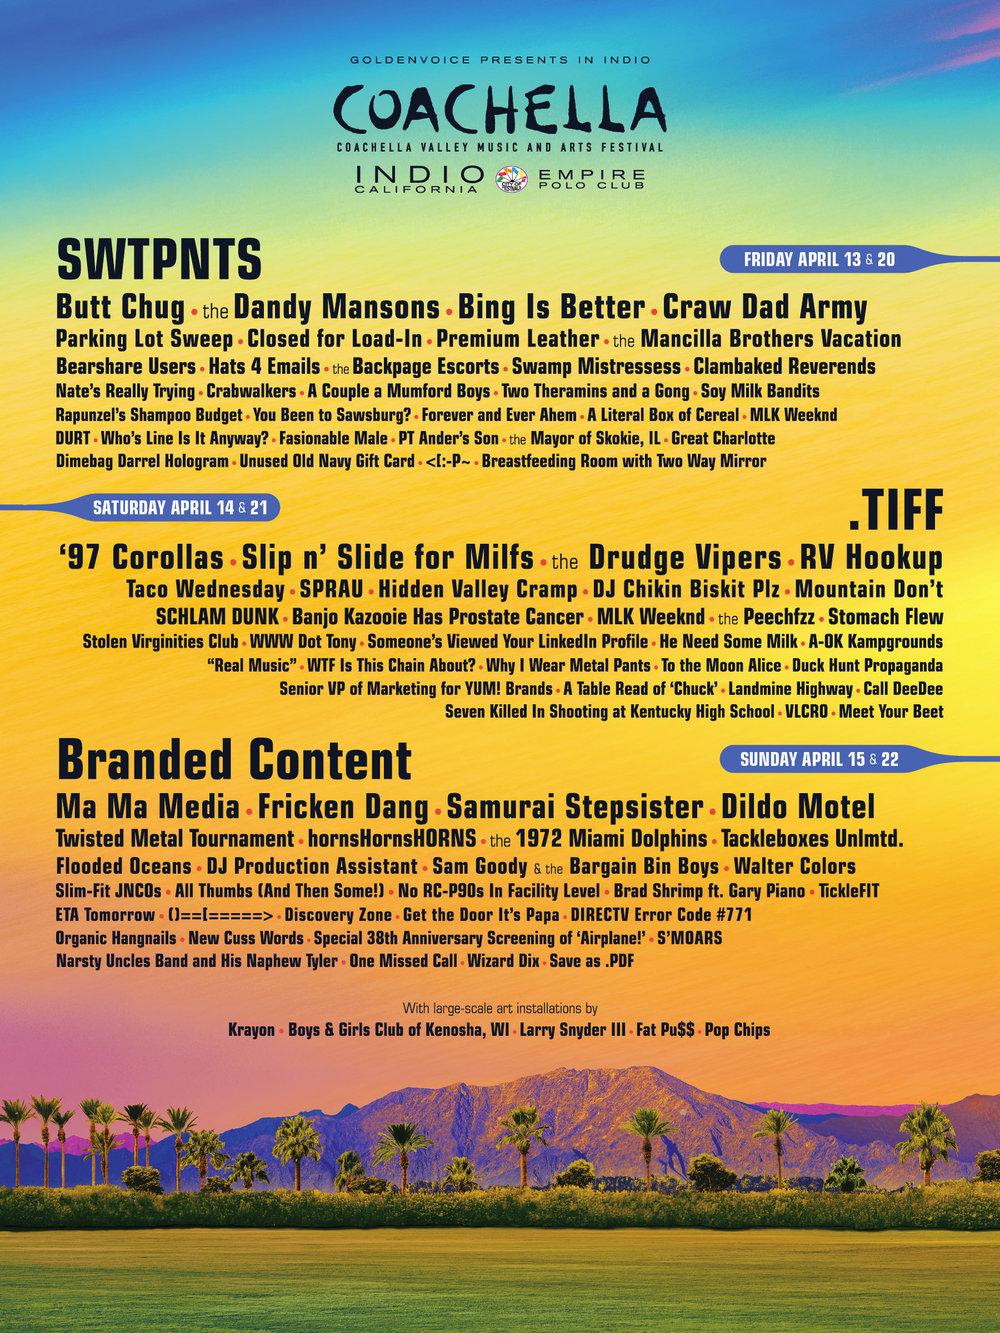 Coachella 2018 Lineup.jpg